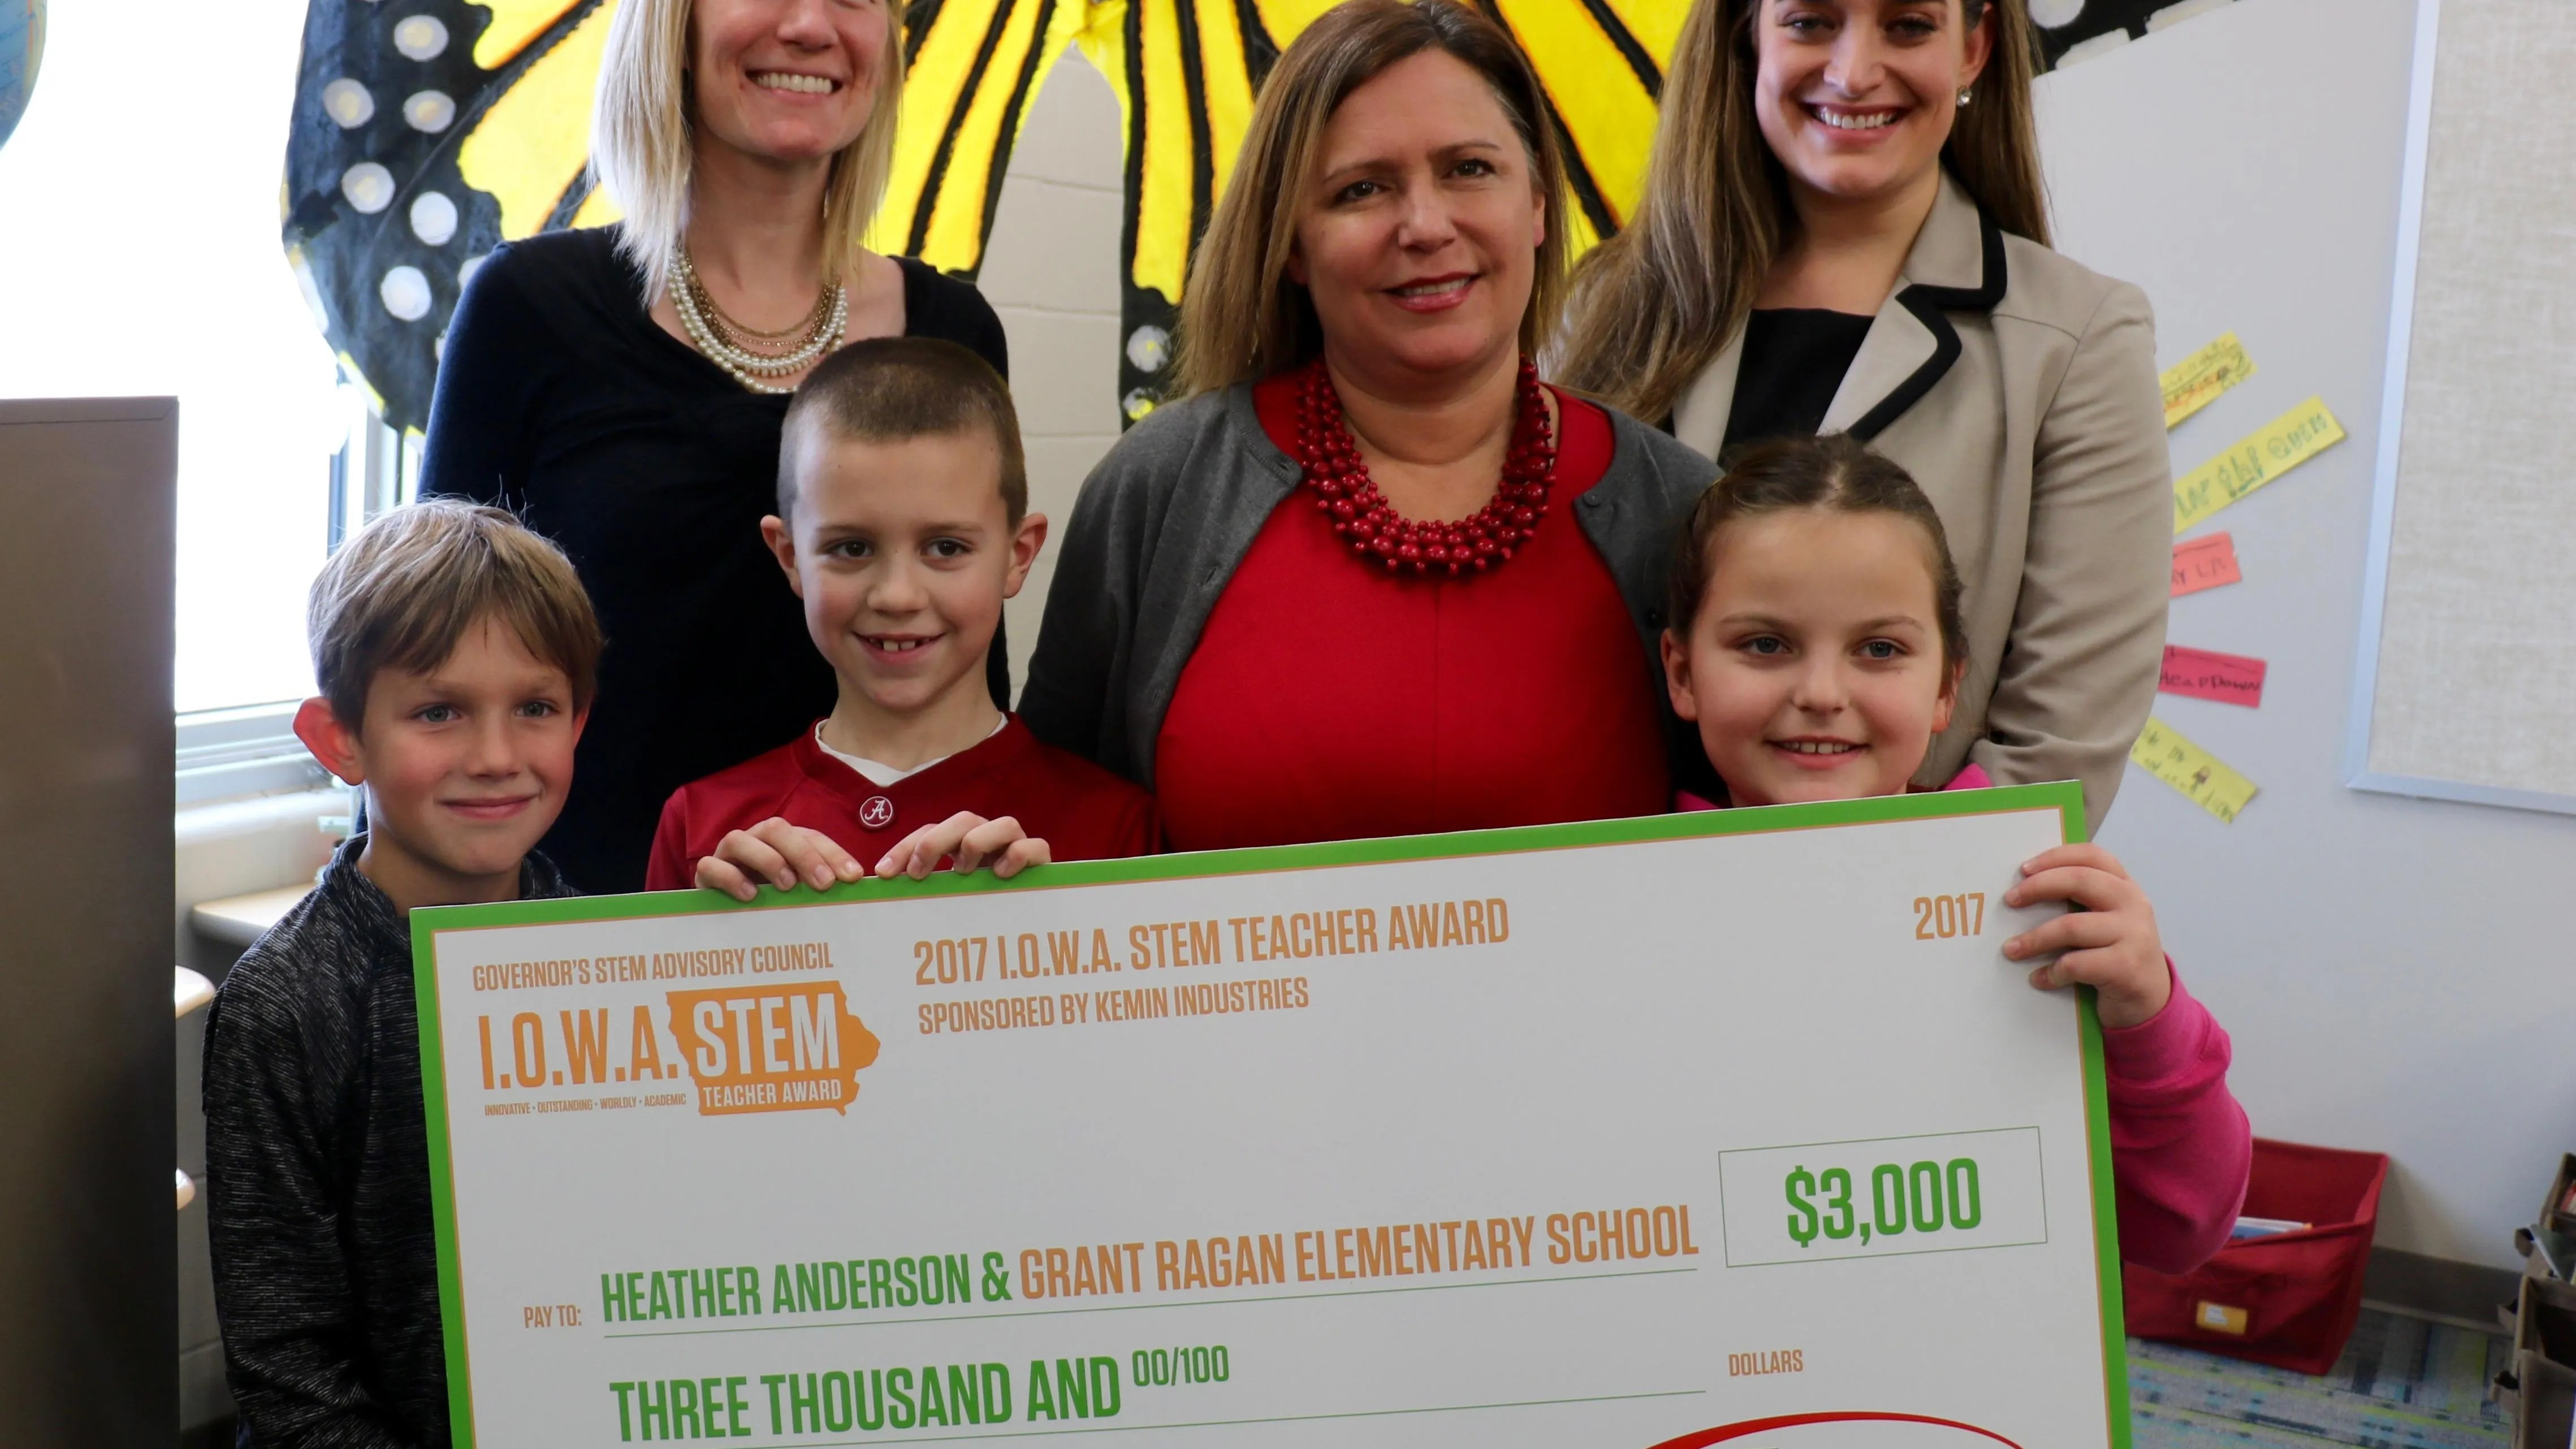 Grant Ragan Elementary Teacher Wins Stem Award